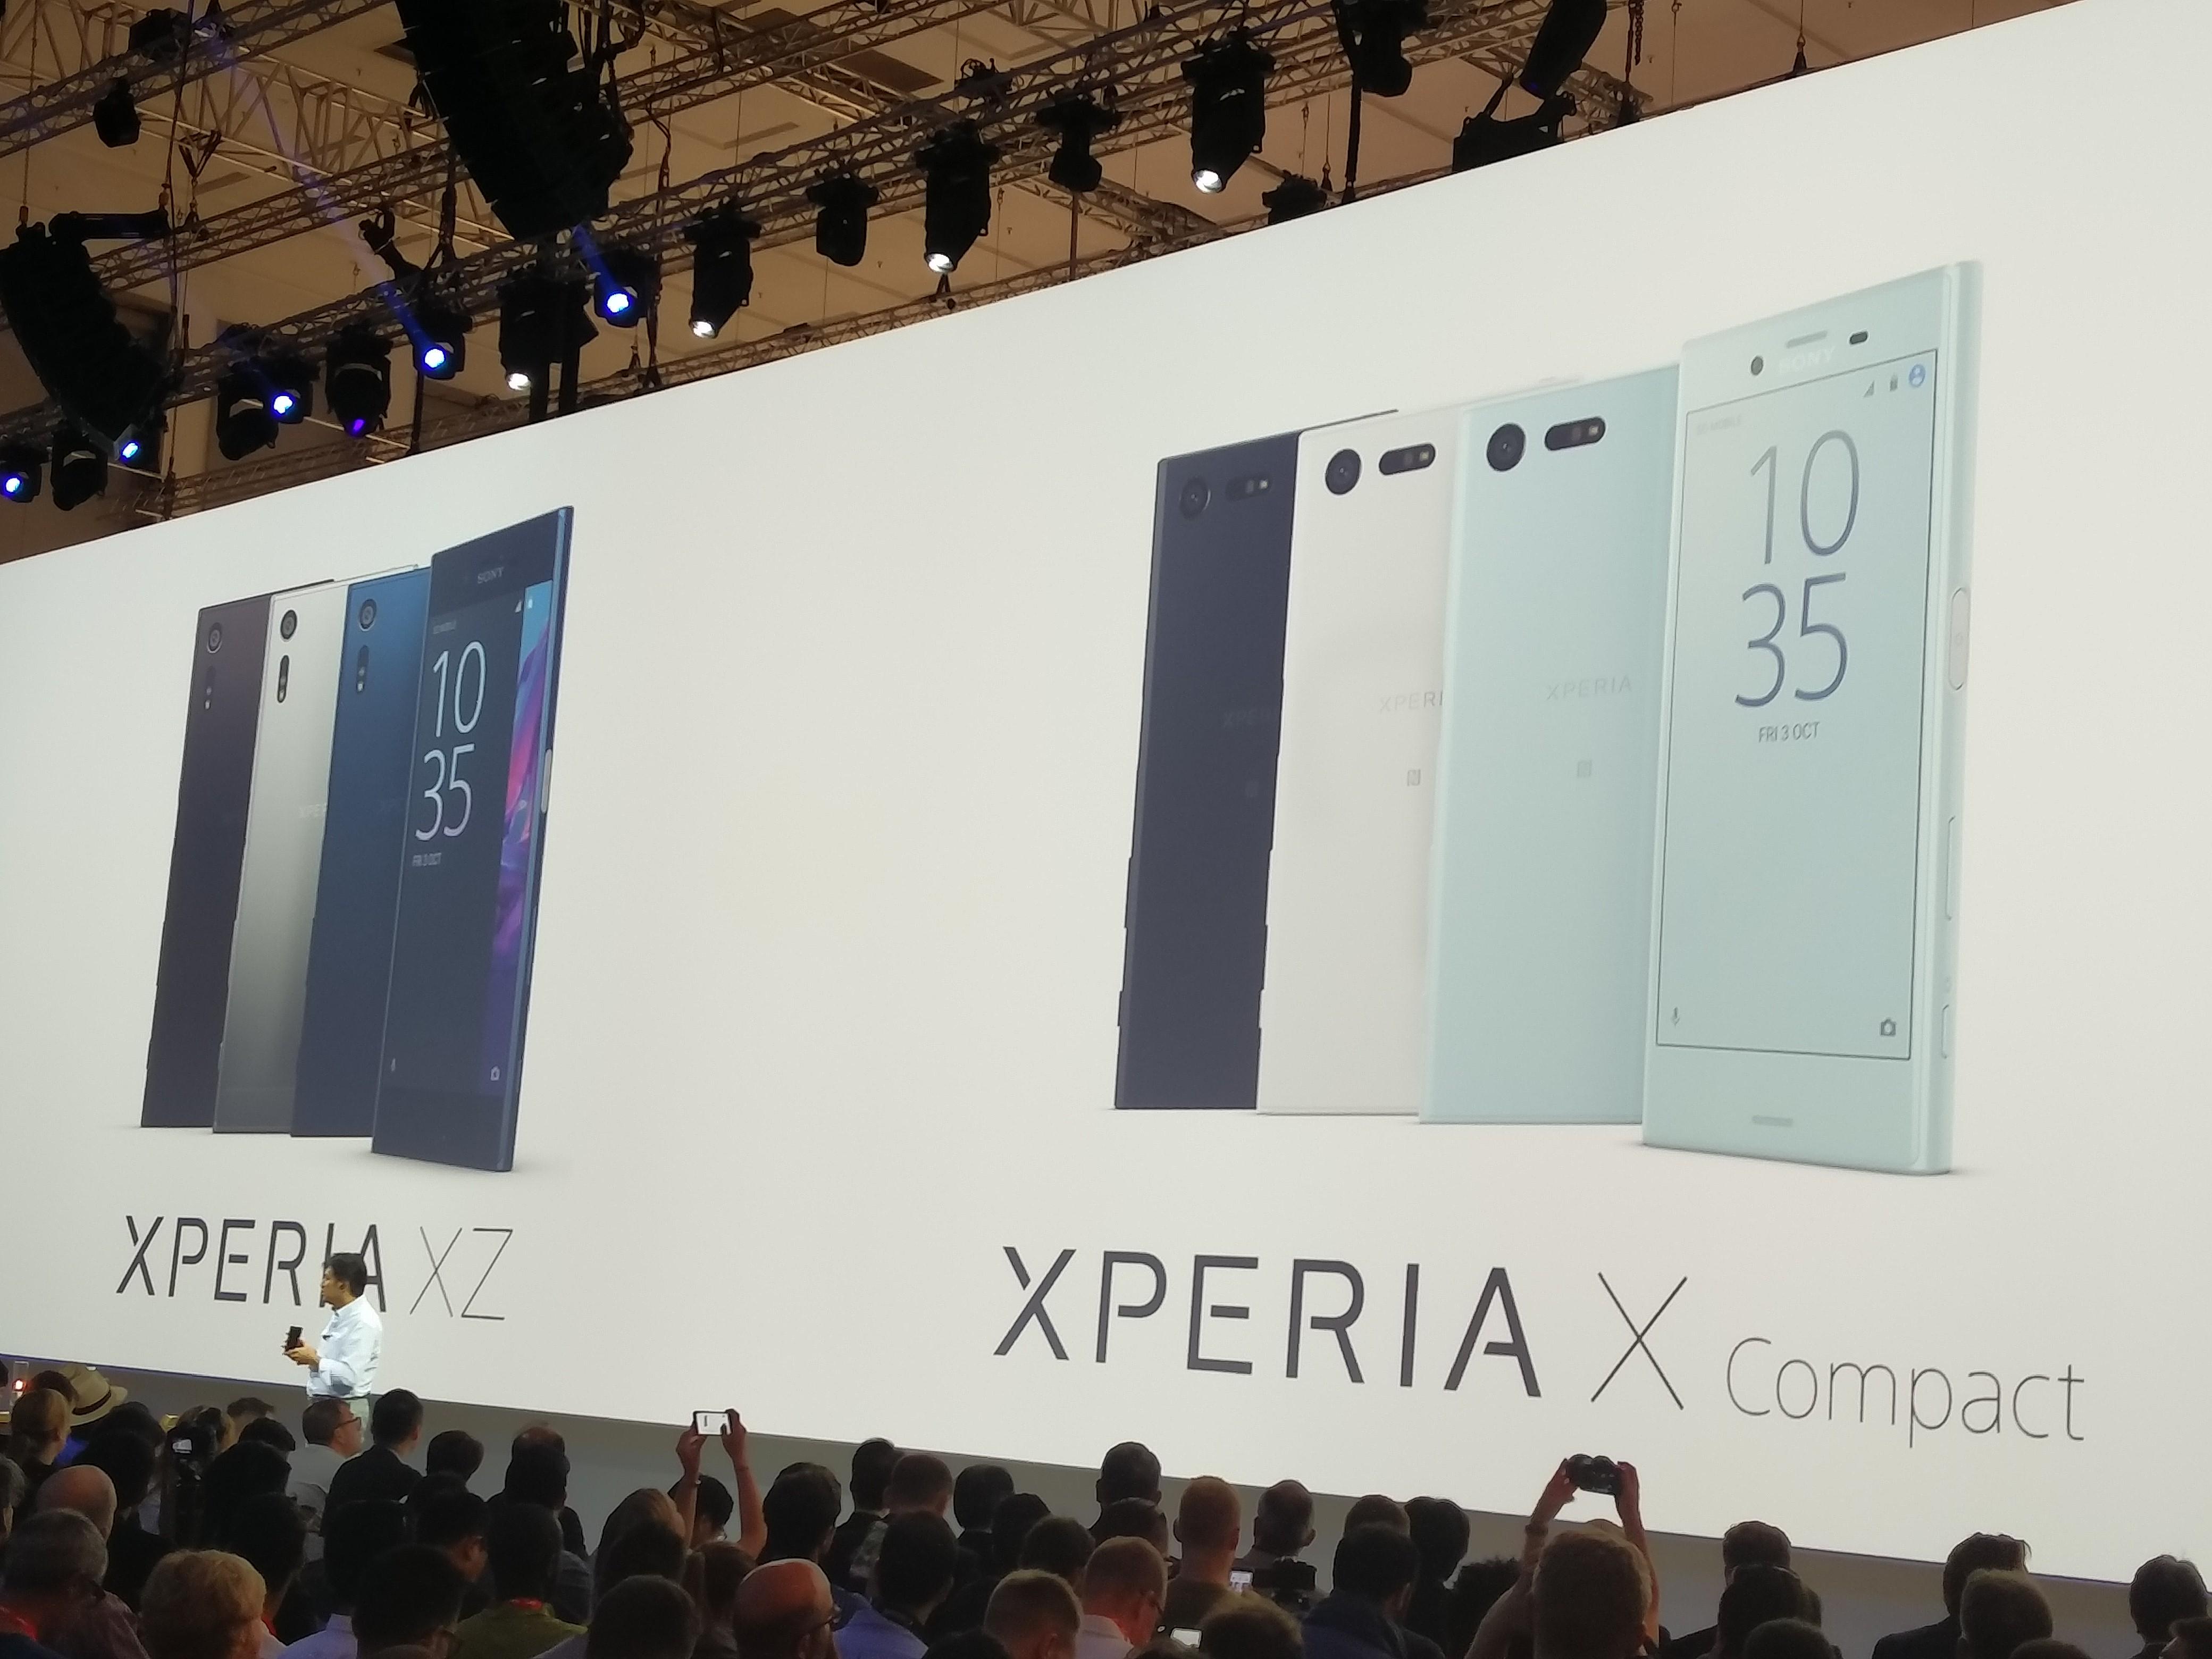 Drugim telefonem jest Xperia X compact